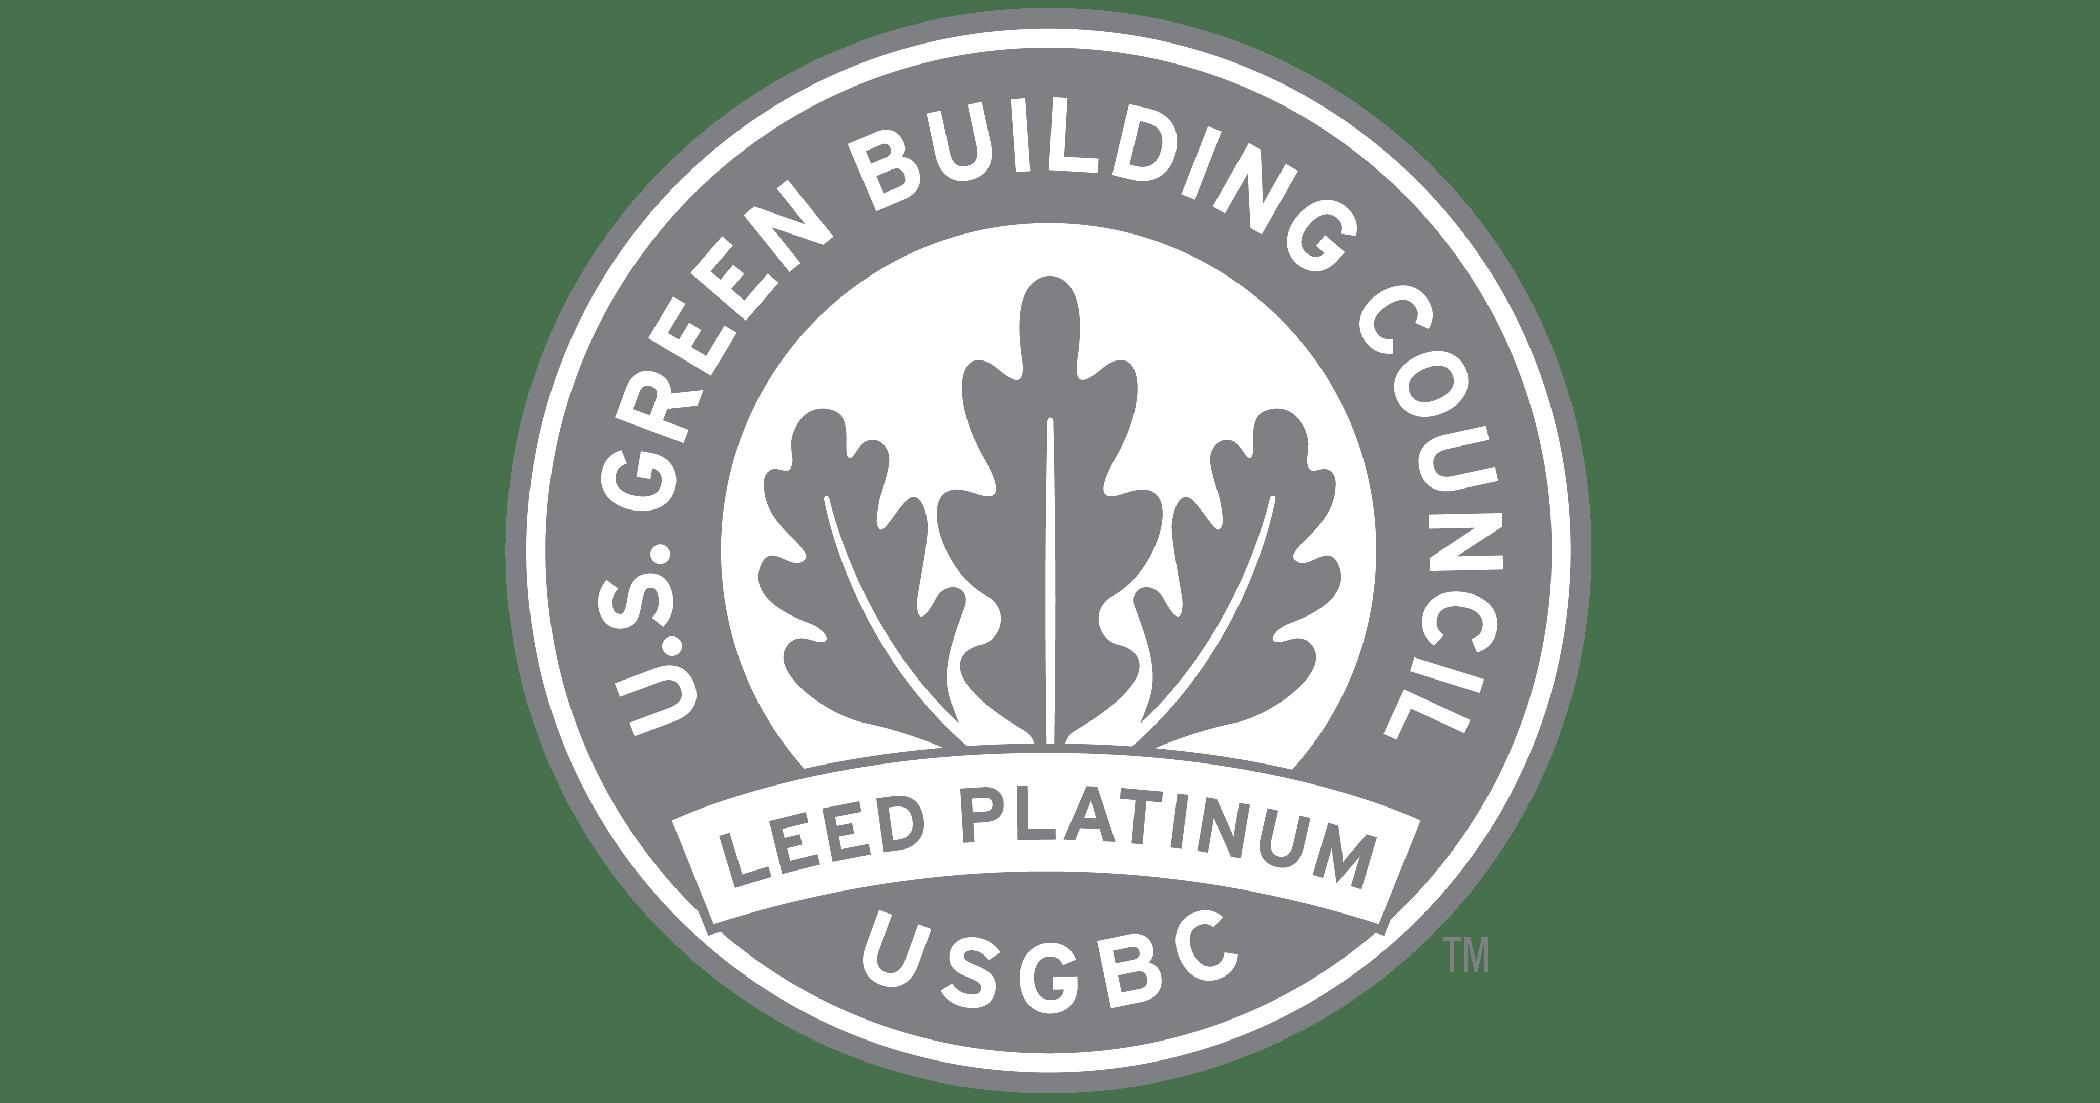 USGBC LEED Platinum.png